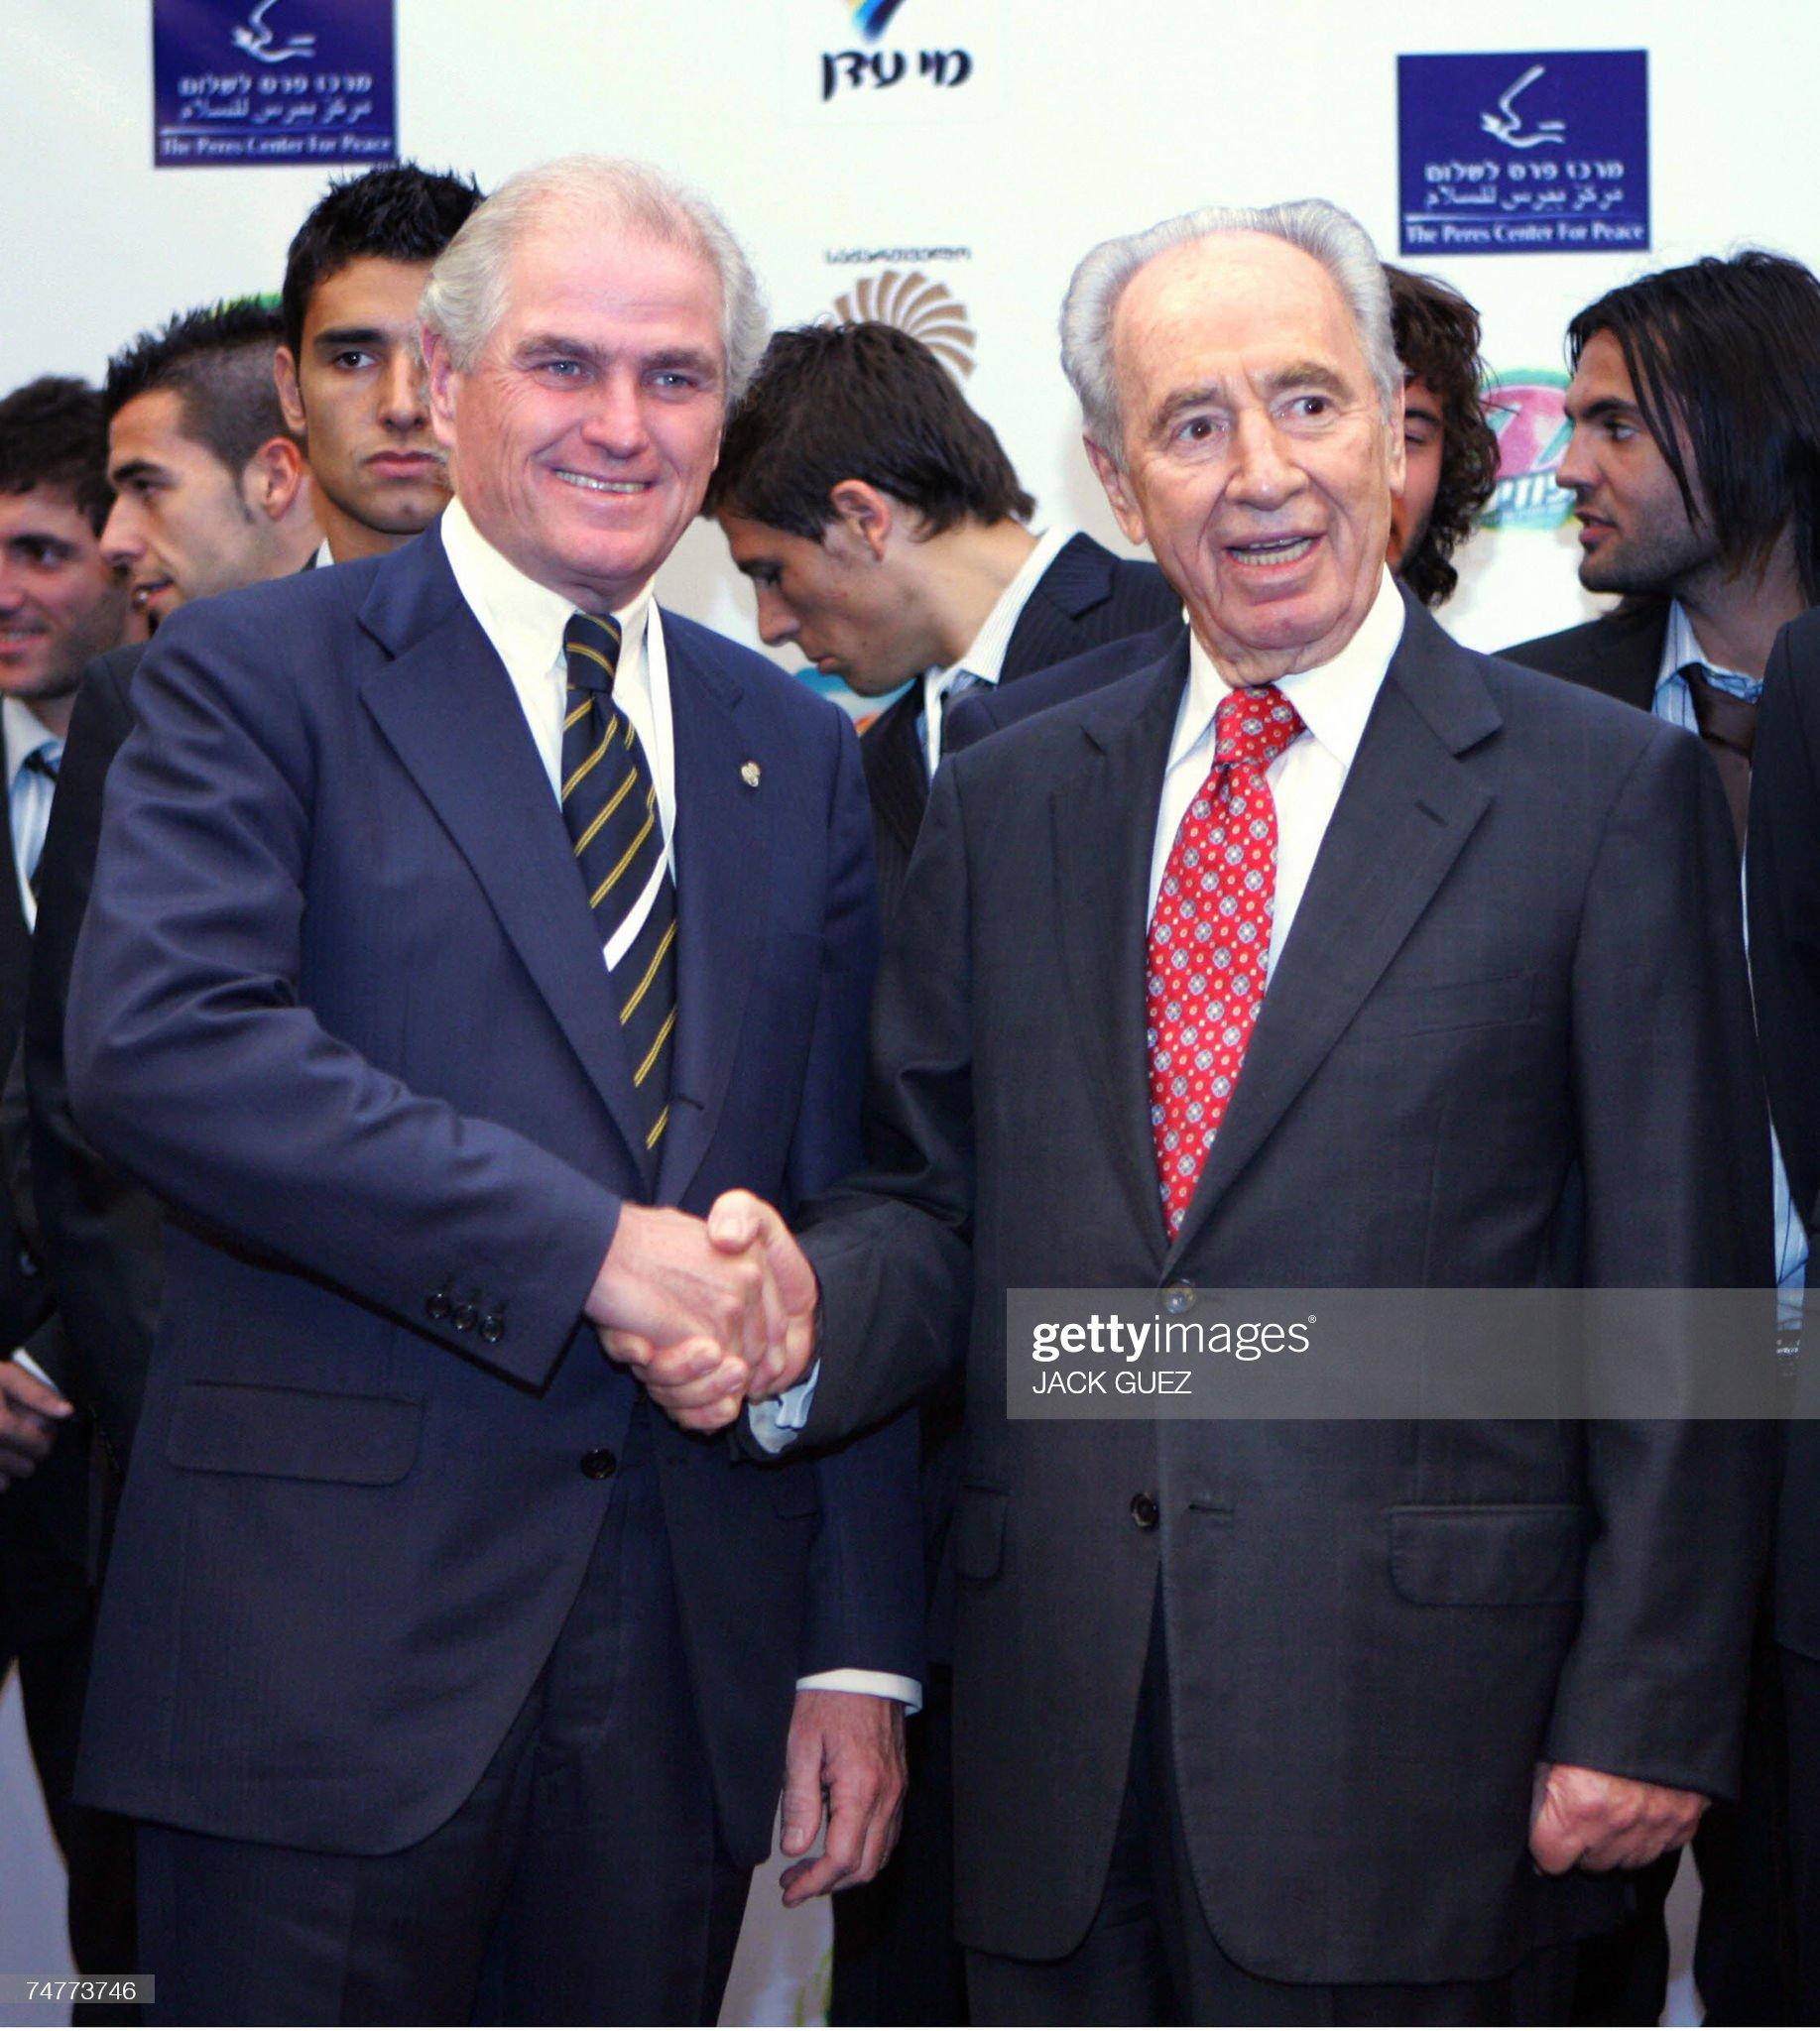 ¿Cuánto mide Ramón Calderón? Tel-aviv-israel-spanish-real-madrid-soccer-team-president-ramon-picture-id74773746?s=2048x2048